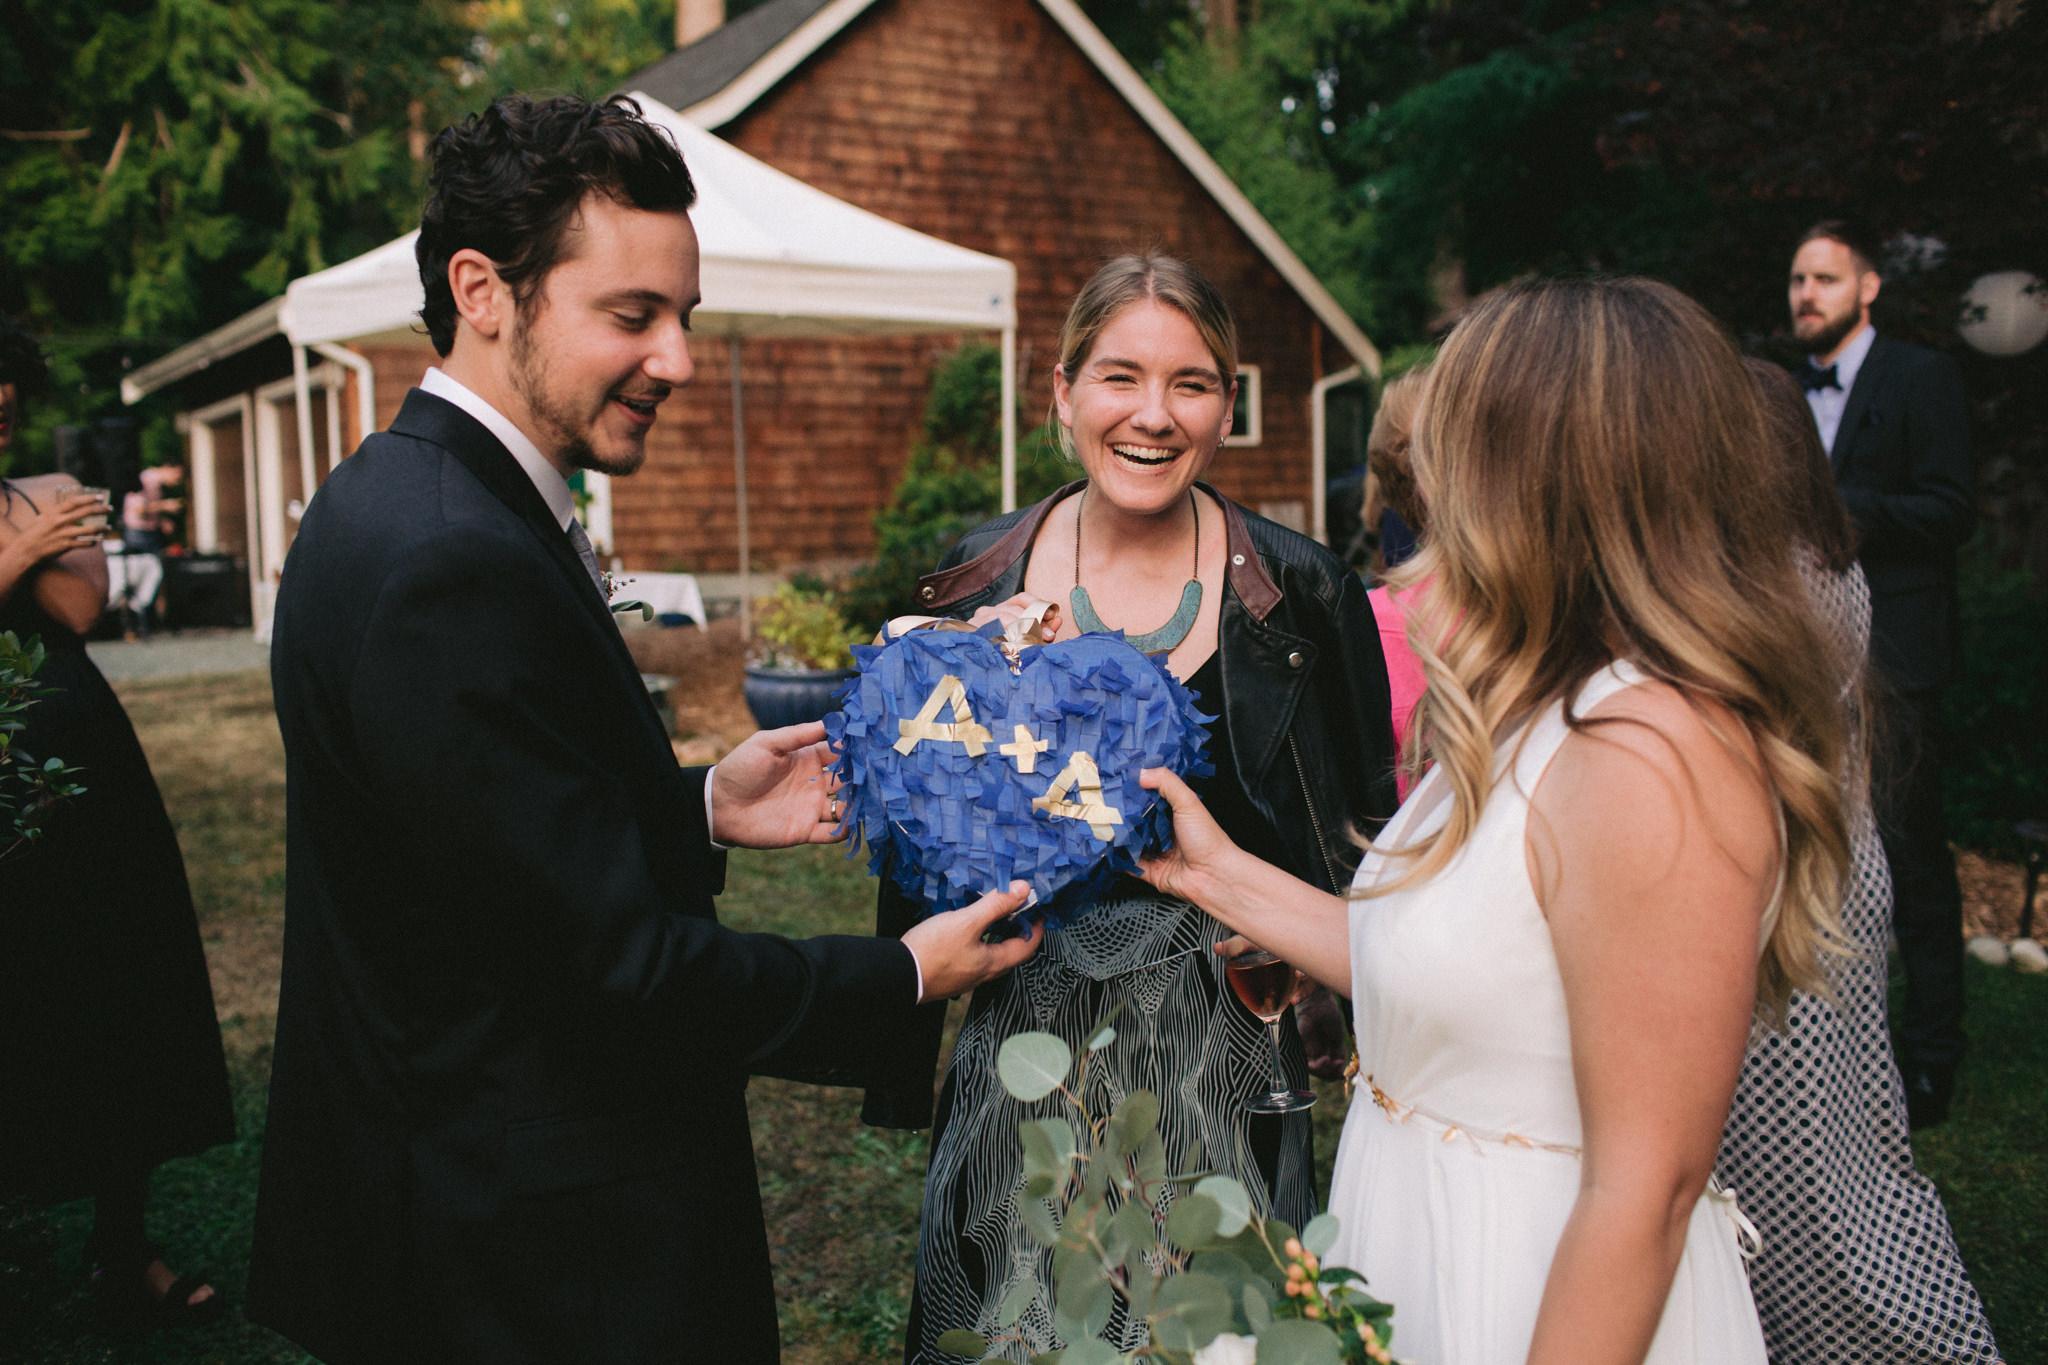 Backyard-Bainbridge-Island-Wedding-Alycia-Lovell-Photography-175.JPG